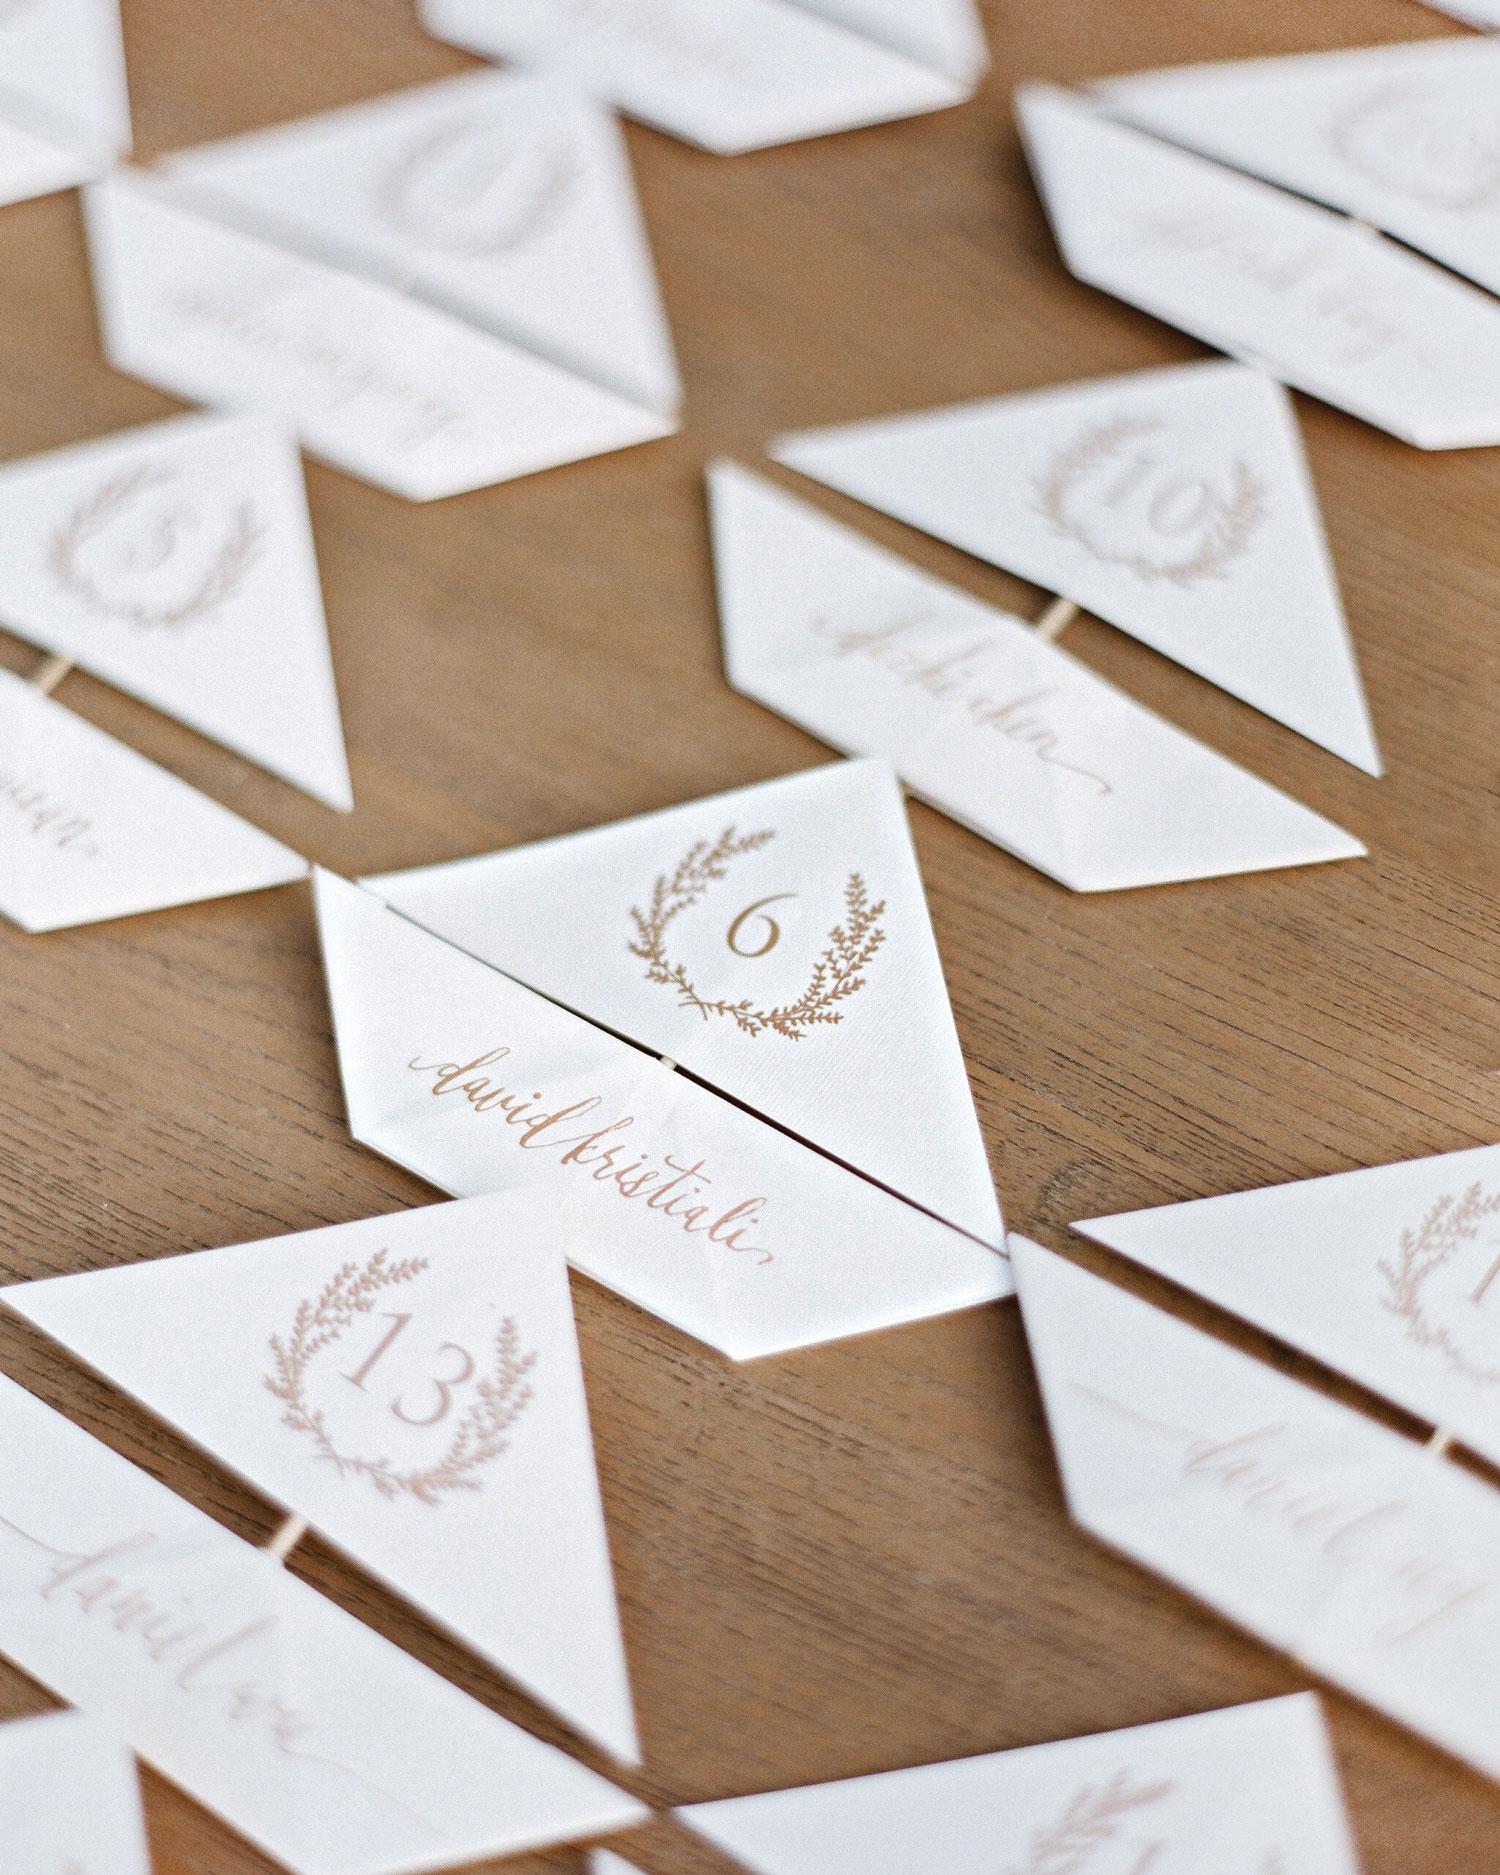 peony-richard-wedding-maldives-seating-cards-1888-s112383.jpg